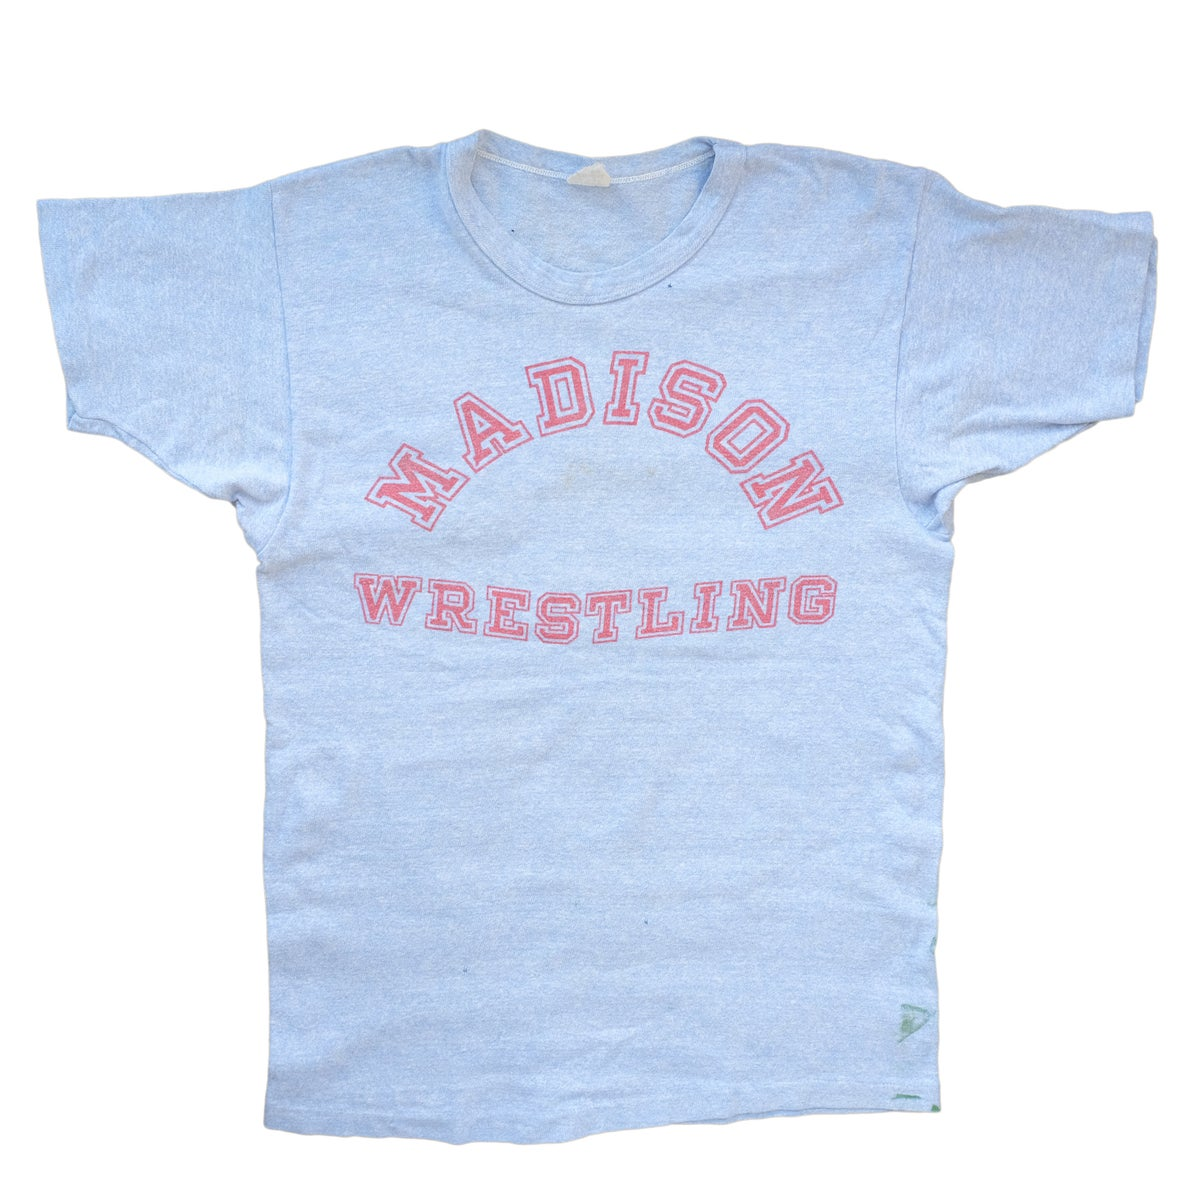 Image of Vintage 1960's Champion Madison Wrestling Tee